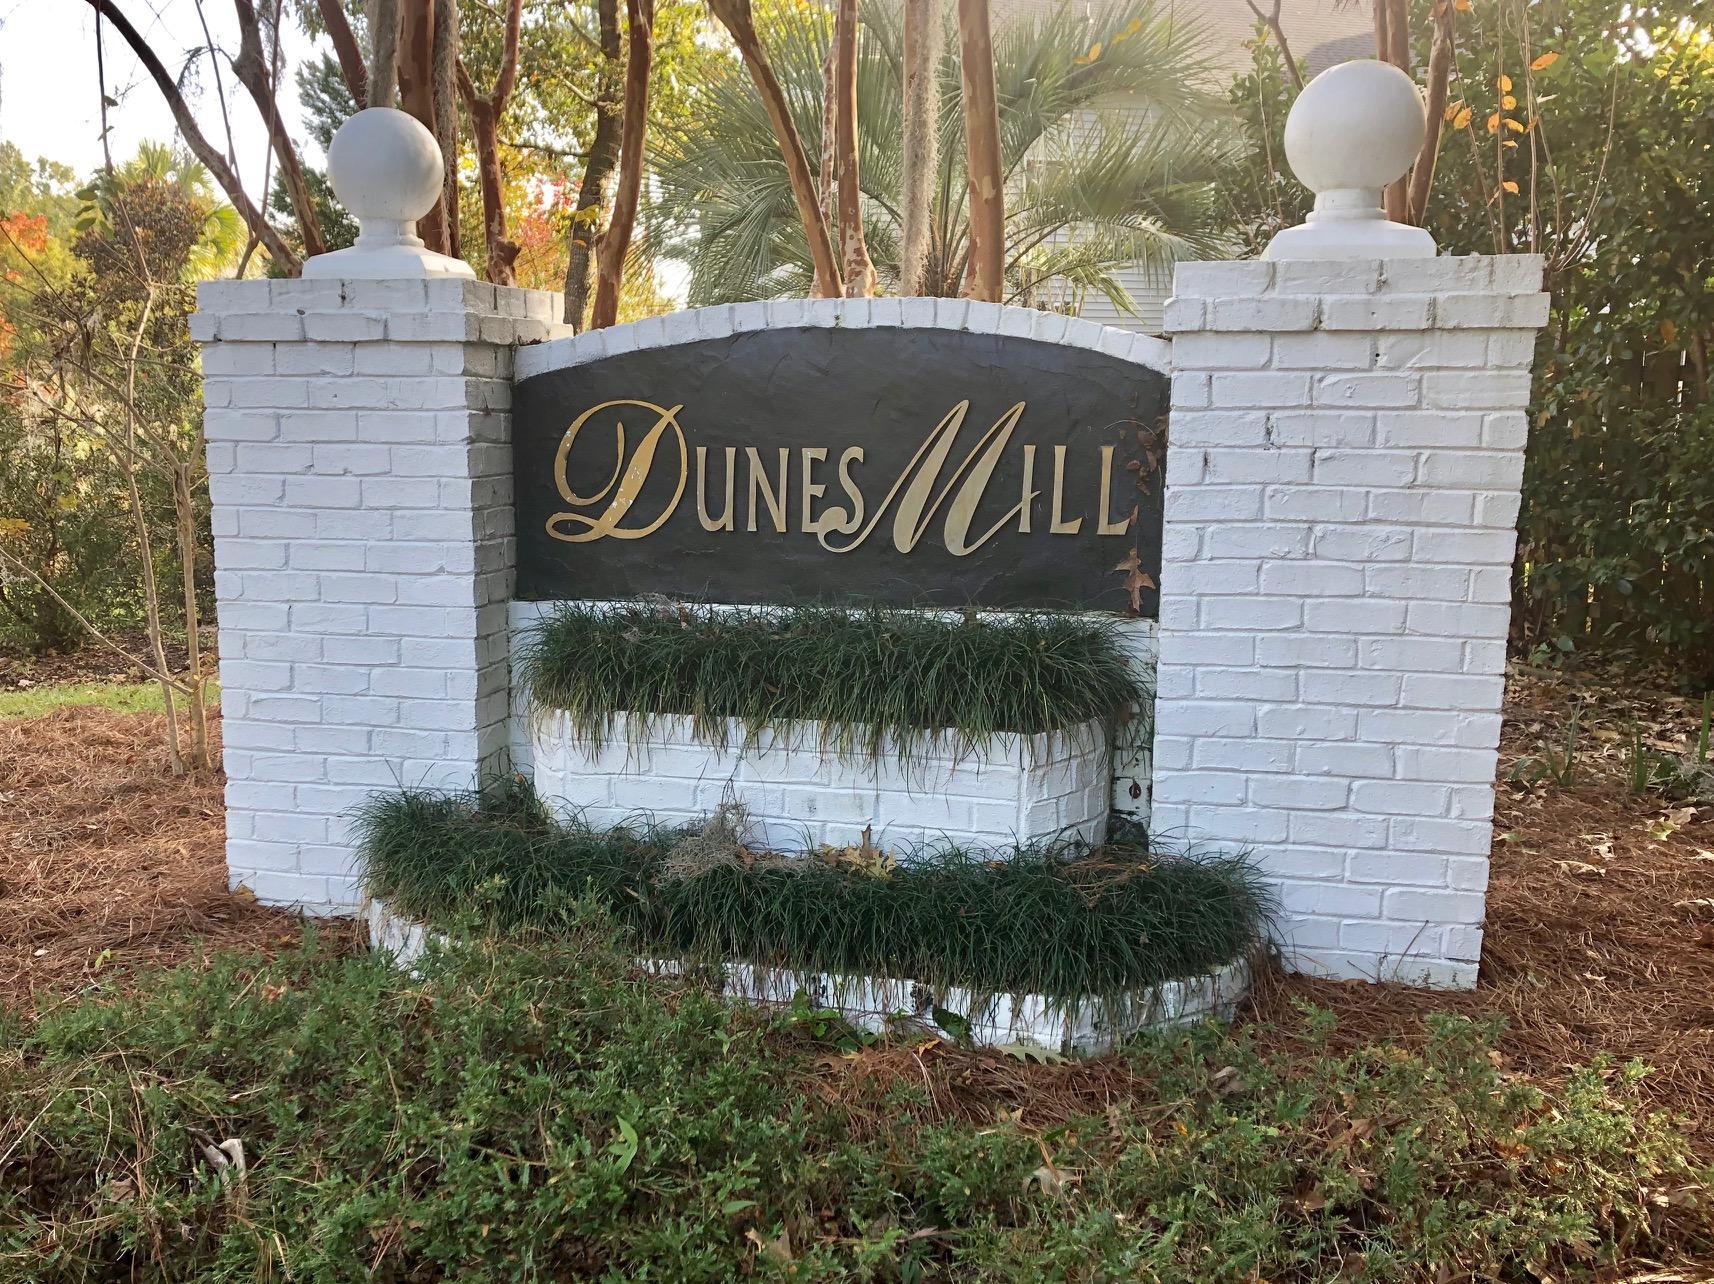 Dunes West Homes For Sale - 1045 Dunes Mill, Mount Pleasant, SC - 14